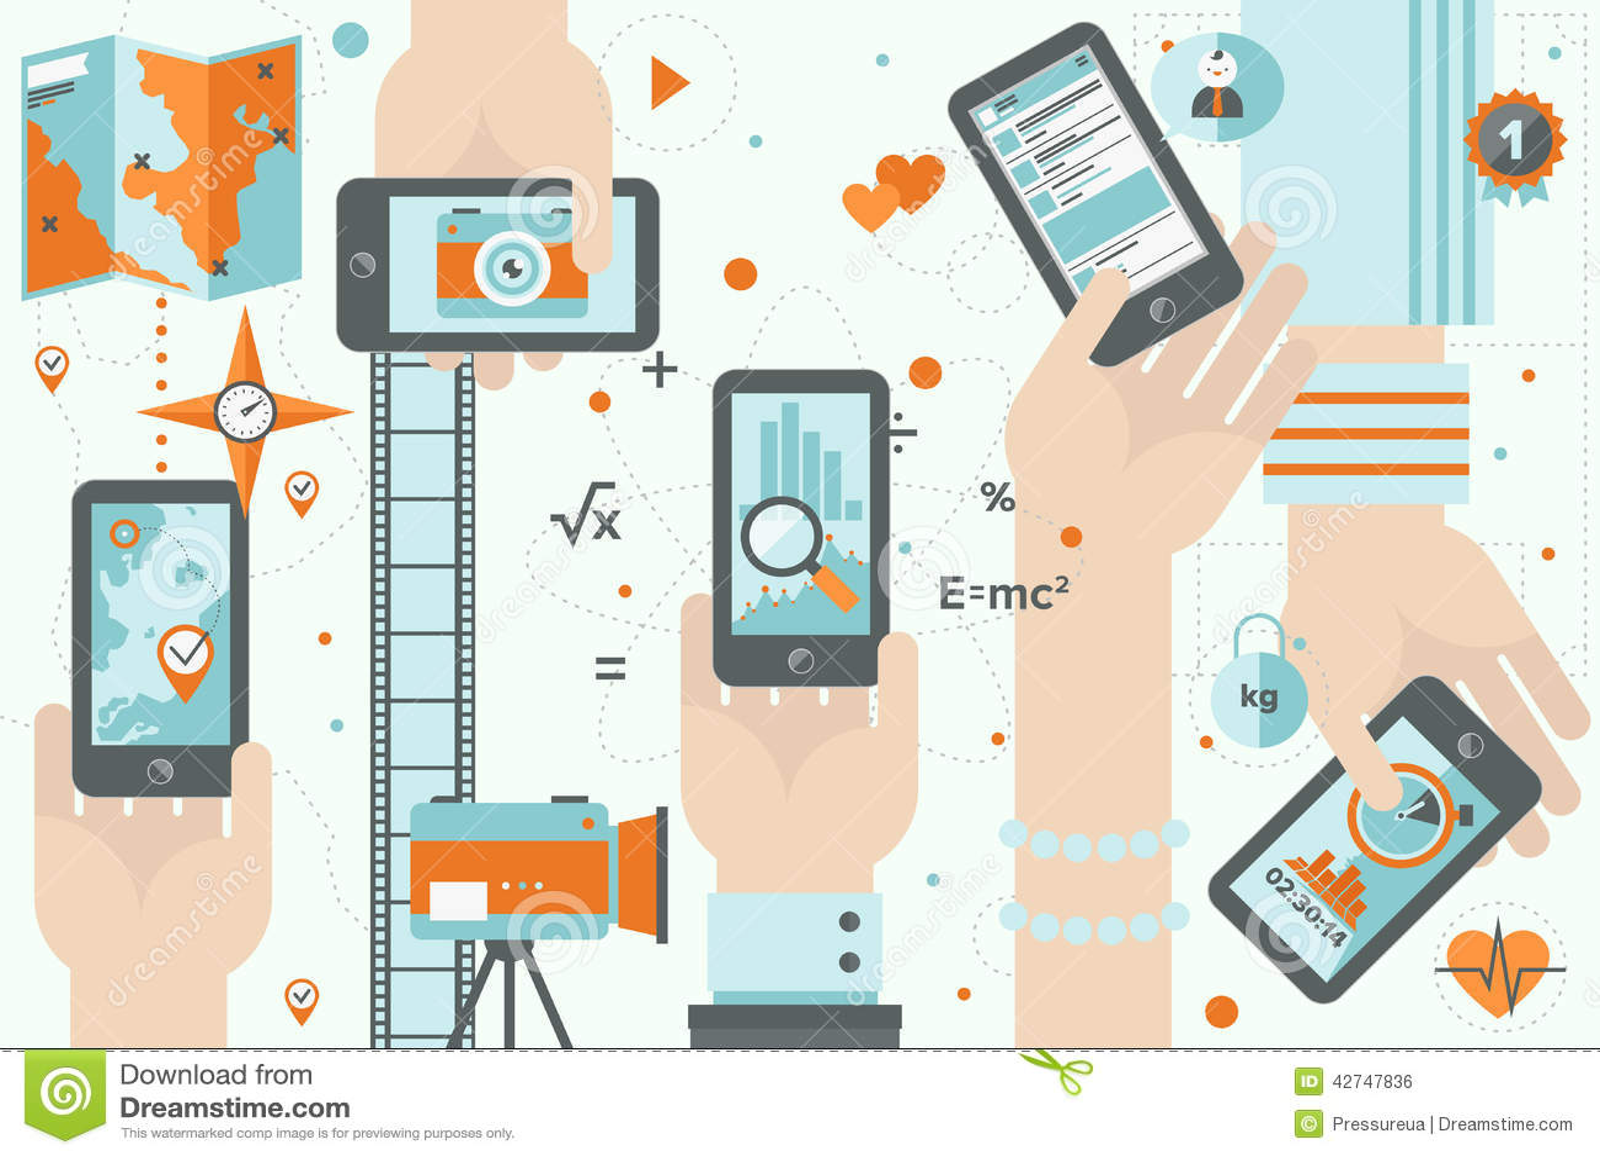 Smartphone apps in action flat design illustration